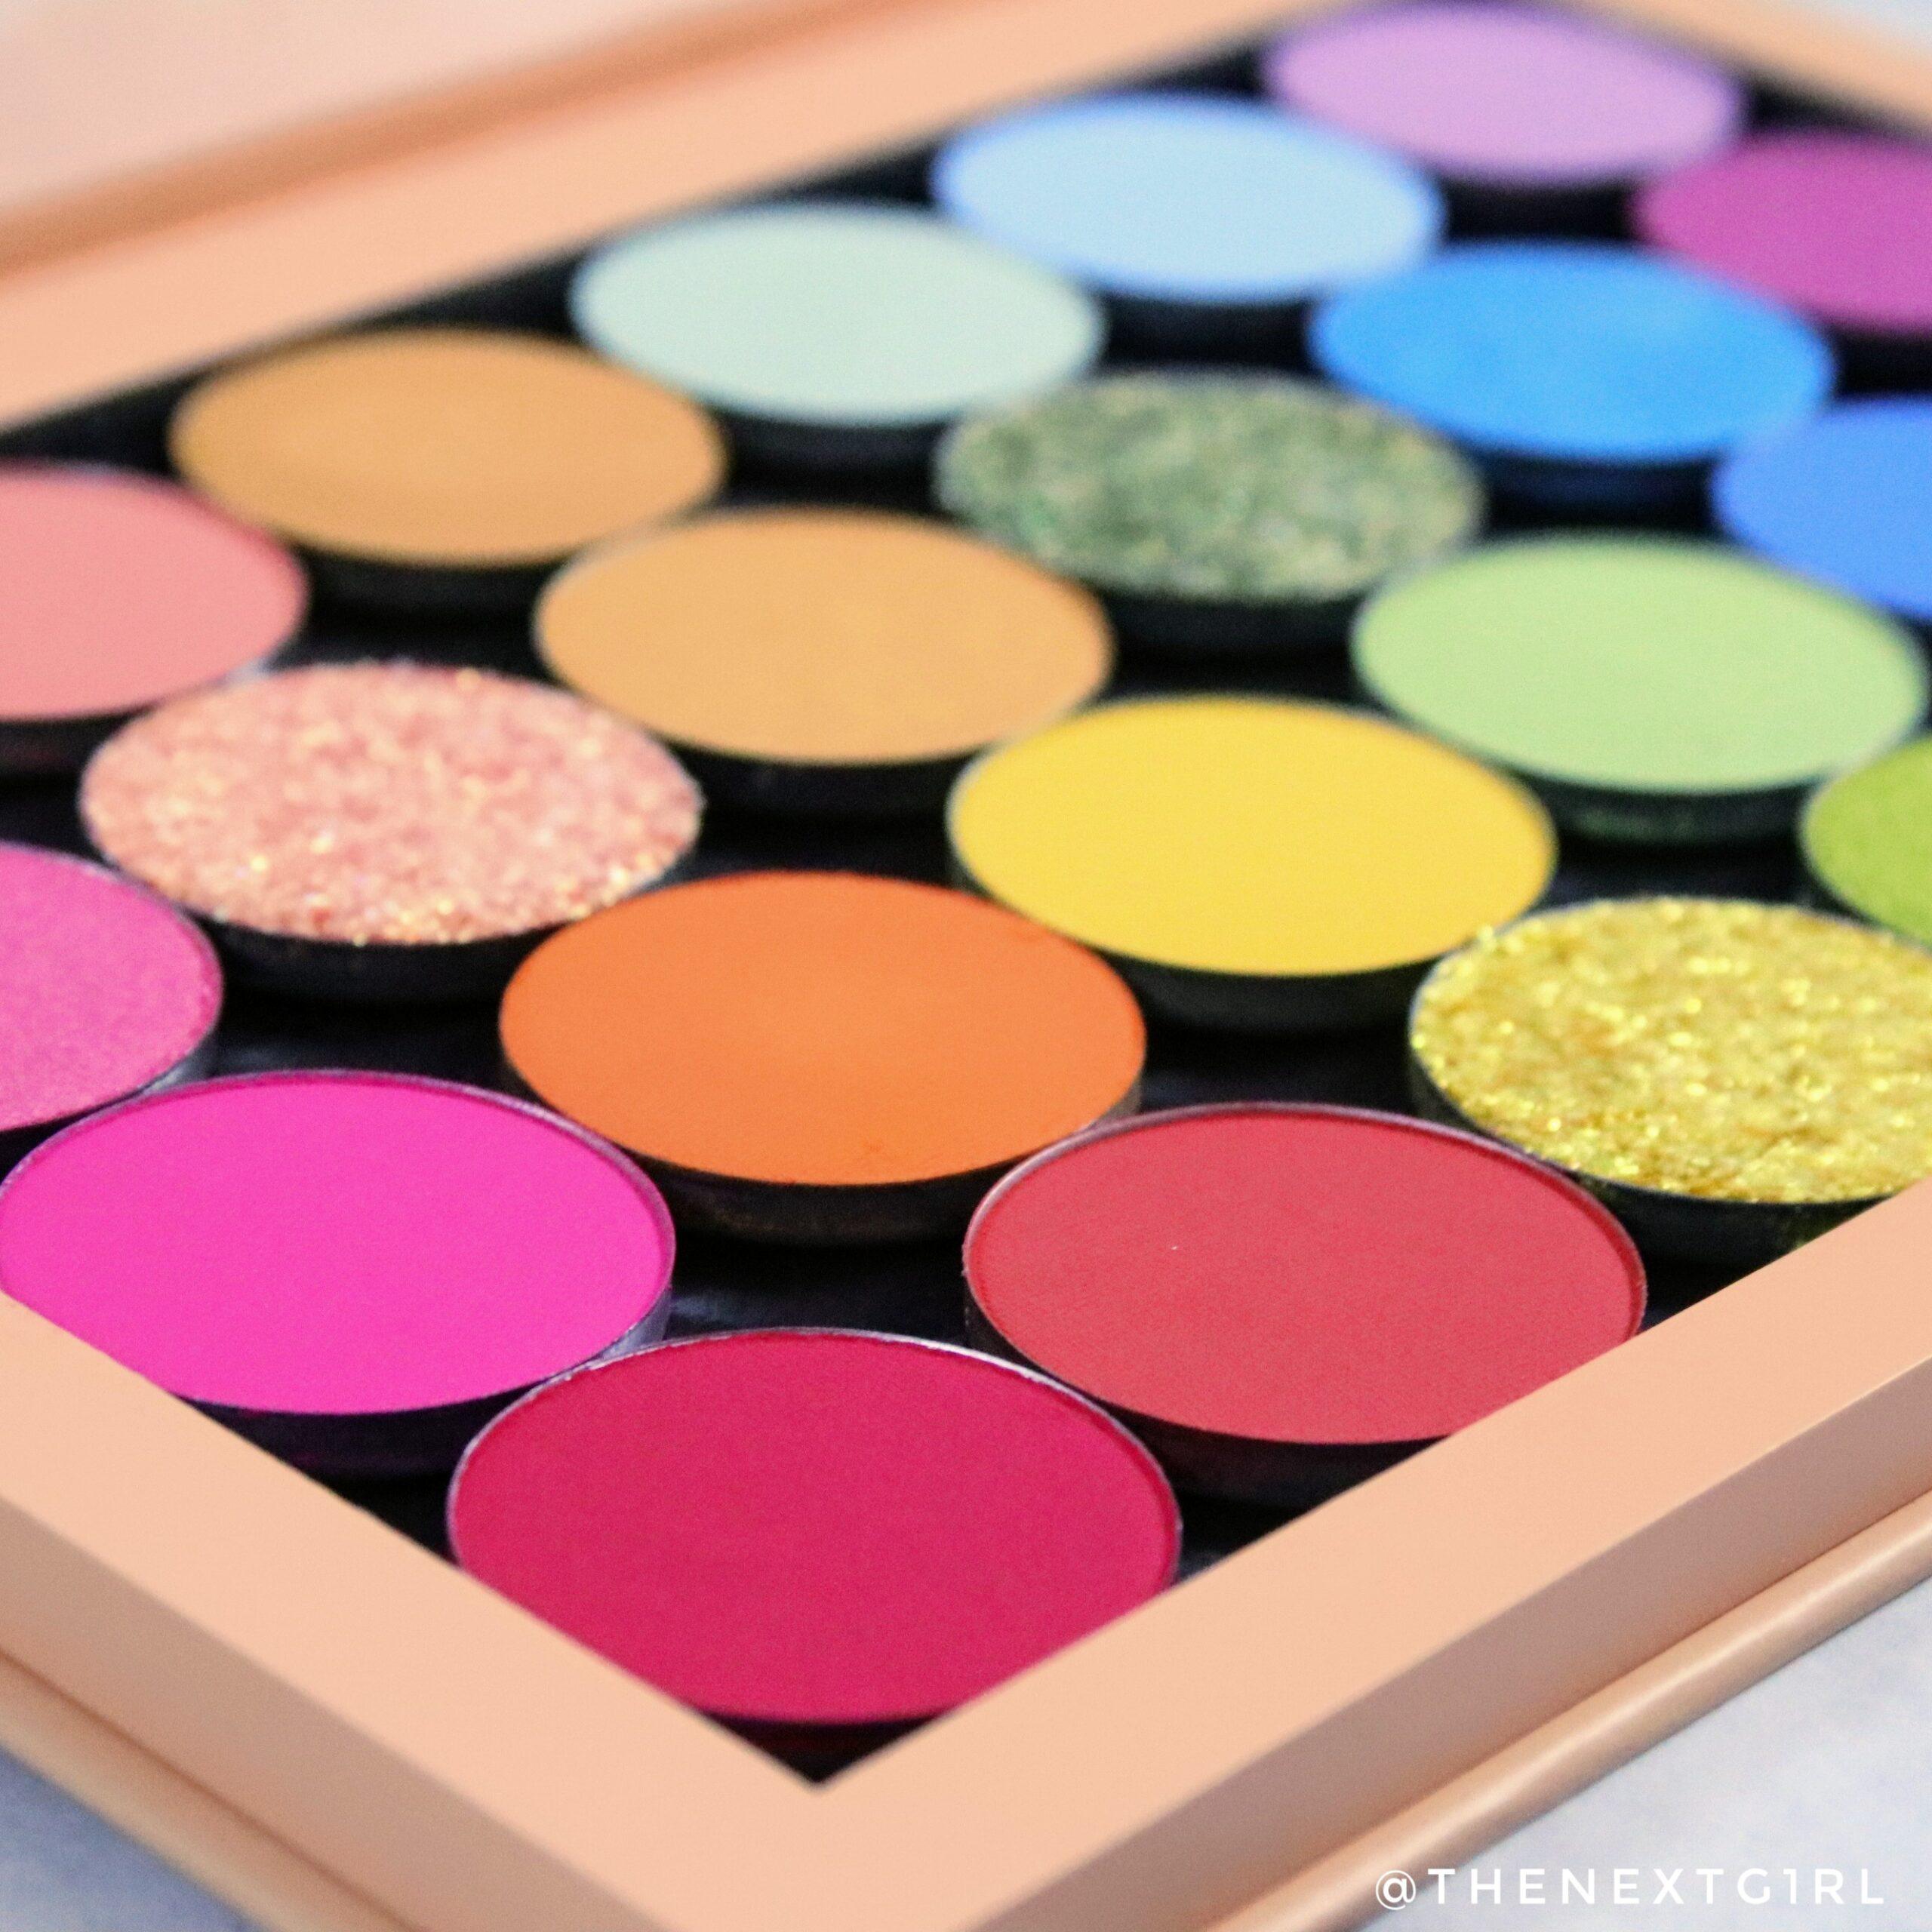 Colourpop She's A Rainbow palette